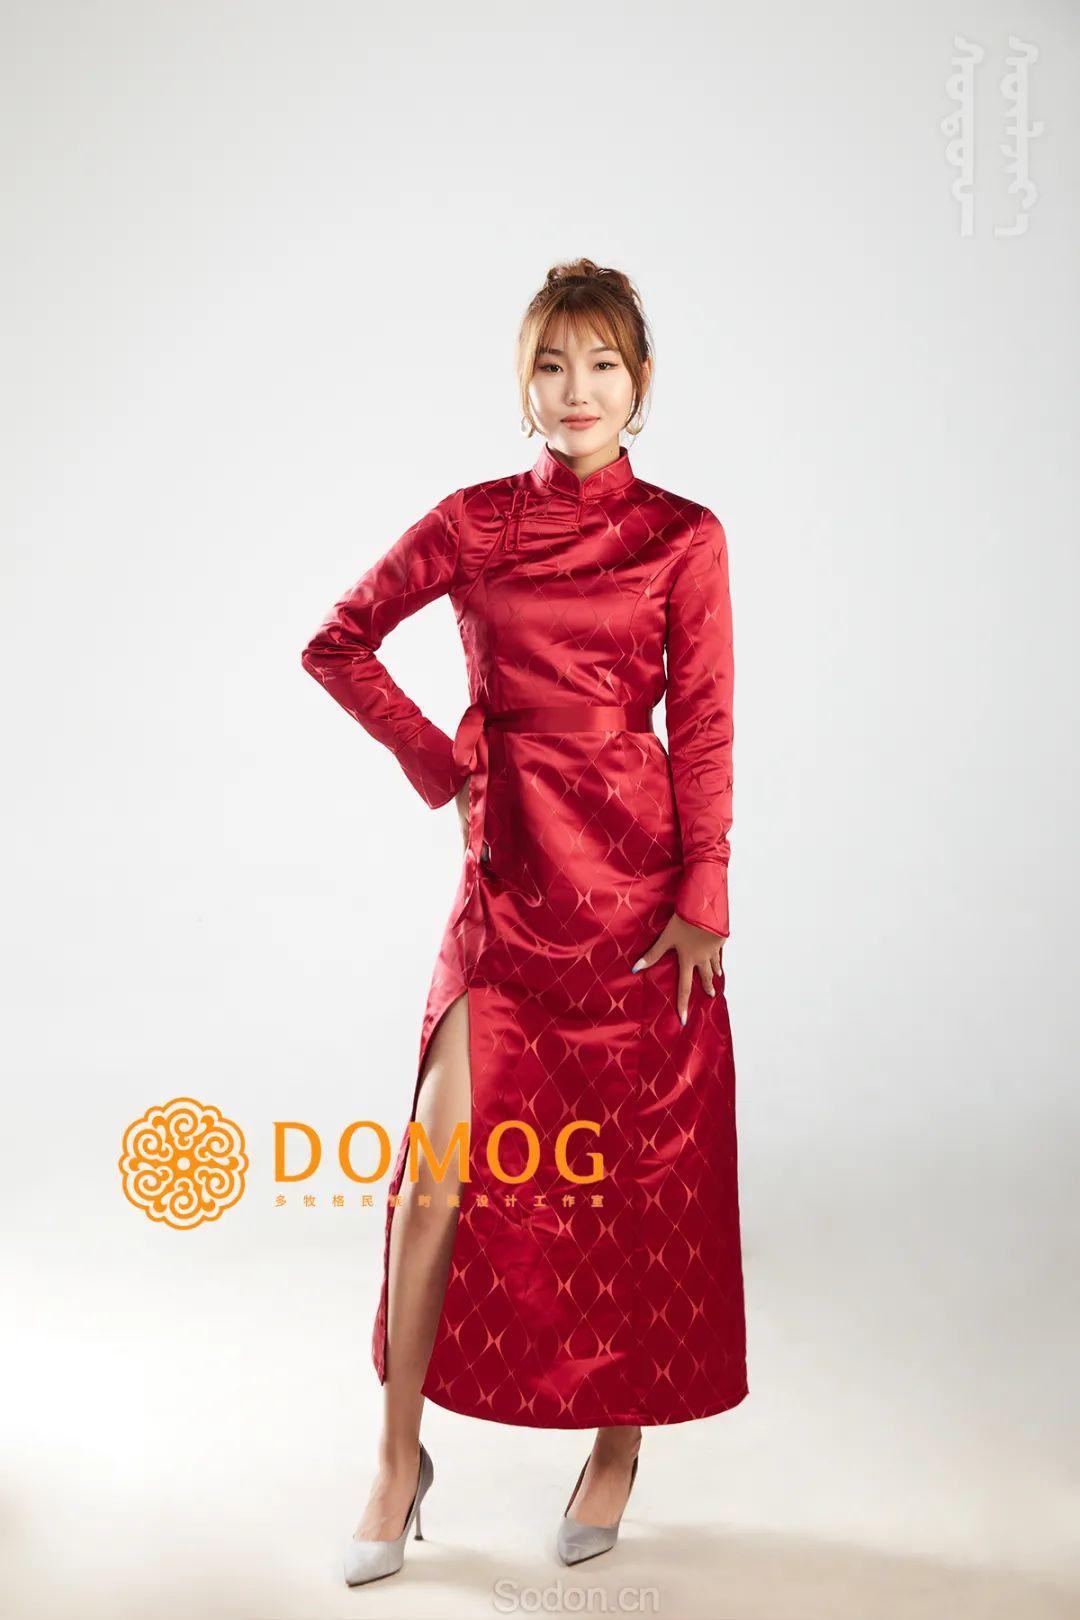 DOMOG 蒙古时装2020新款,民族与时尚的融合 第15张 DOMOG 蒙古时装2020新款,民族与时尚的融合 蒙古服饰